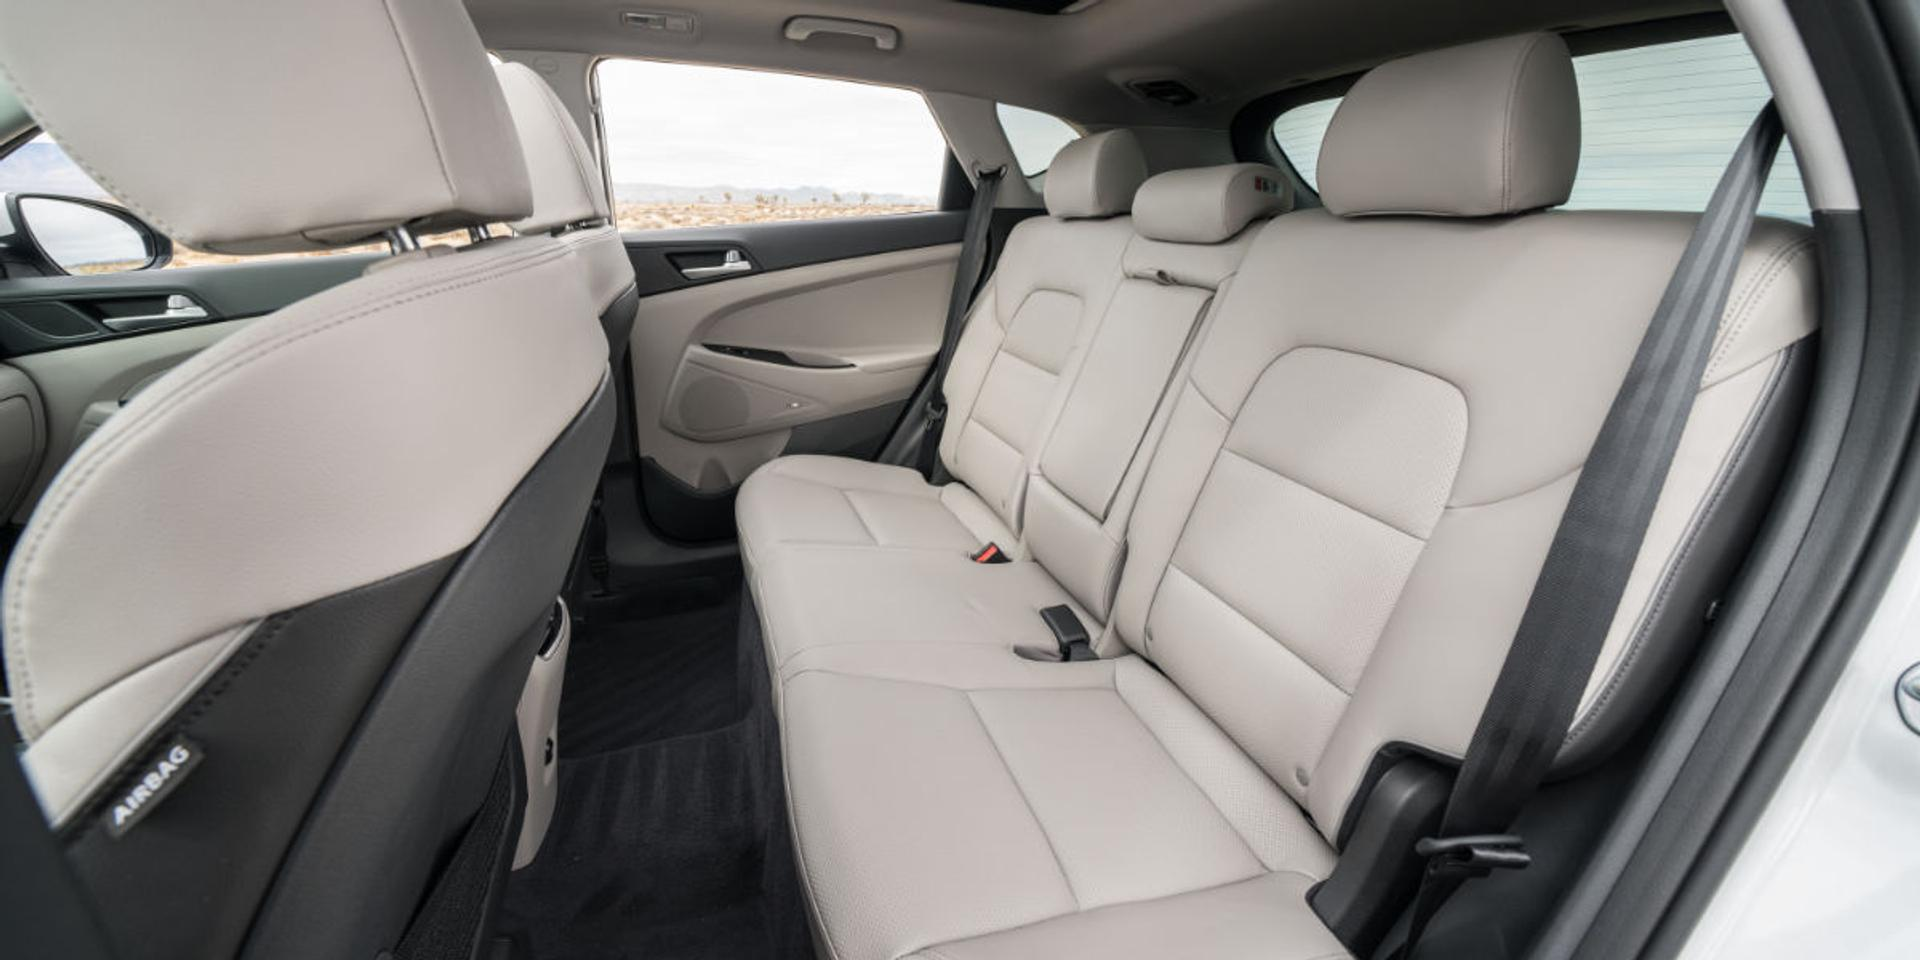 Hyundai Tucson rear seats